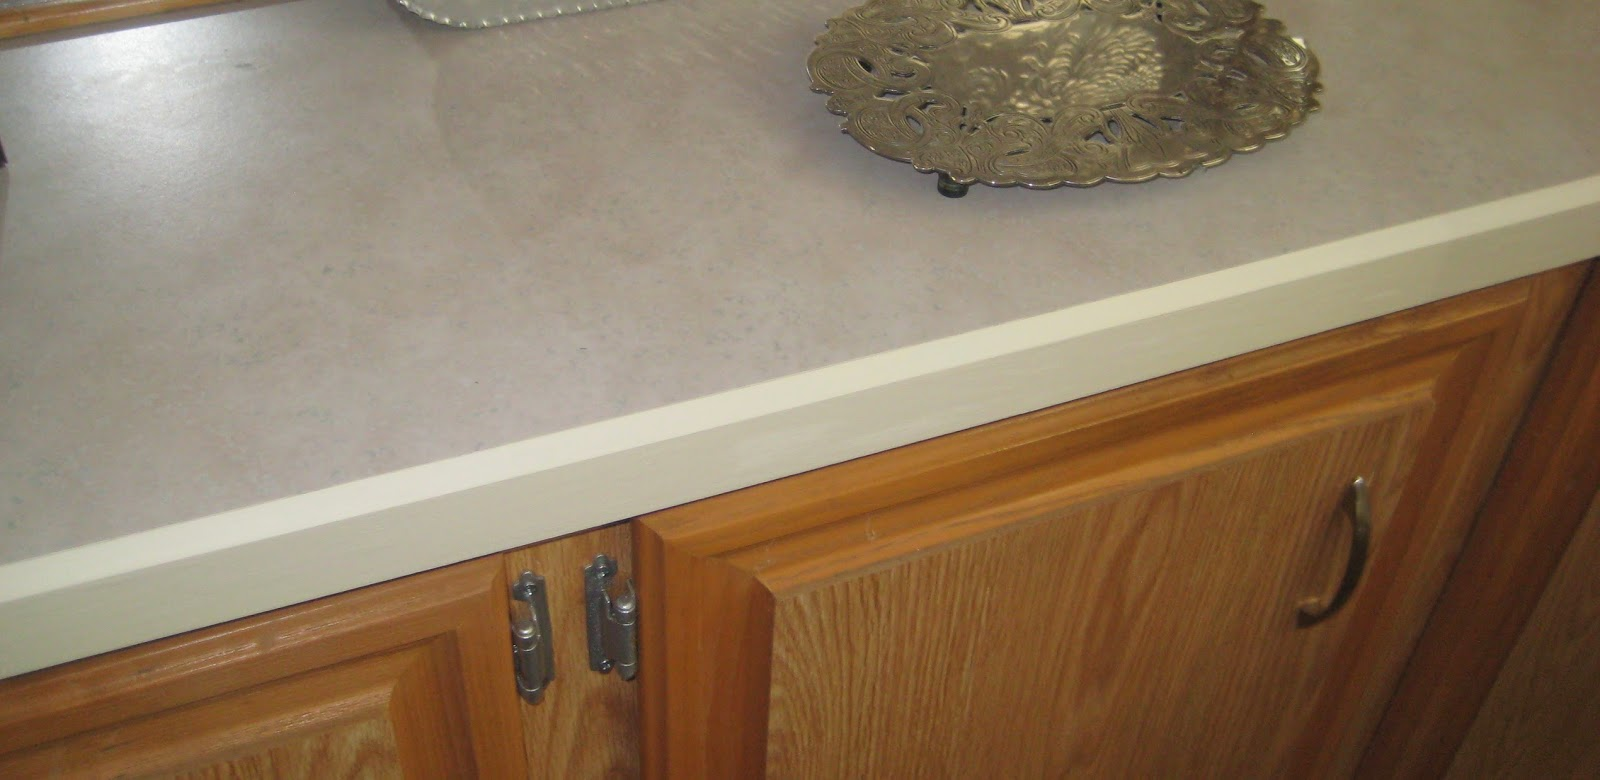 damaged granite countertop counter floor loose dedham project repair top specialized seam broken care